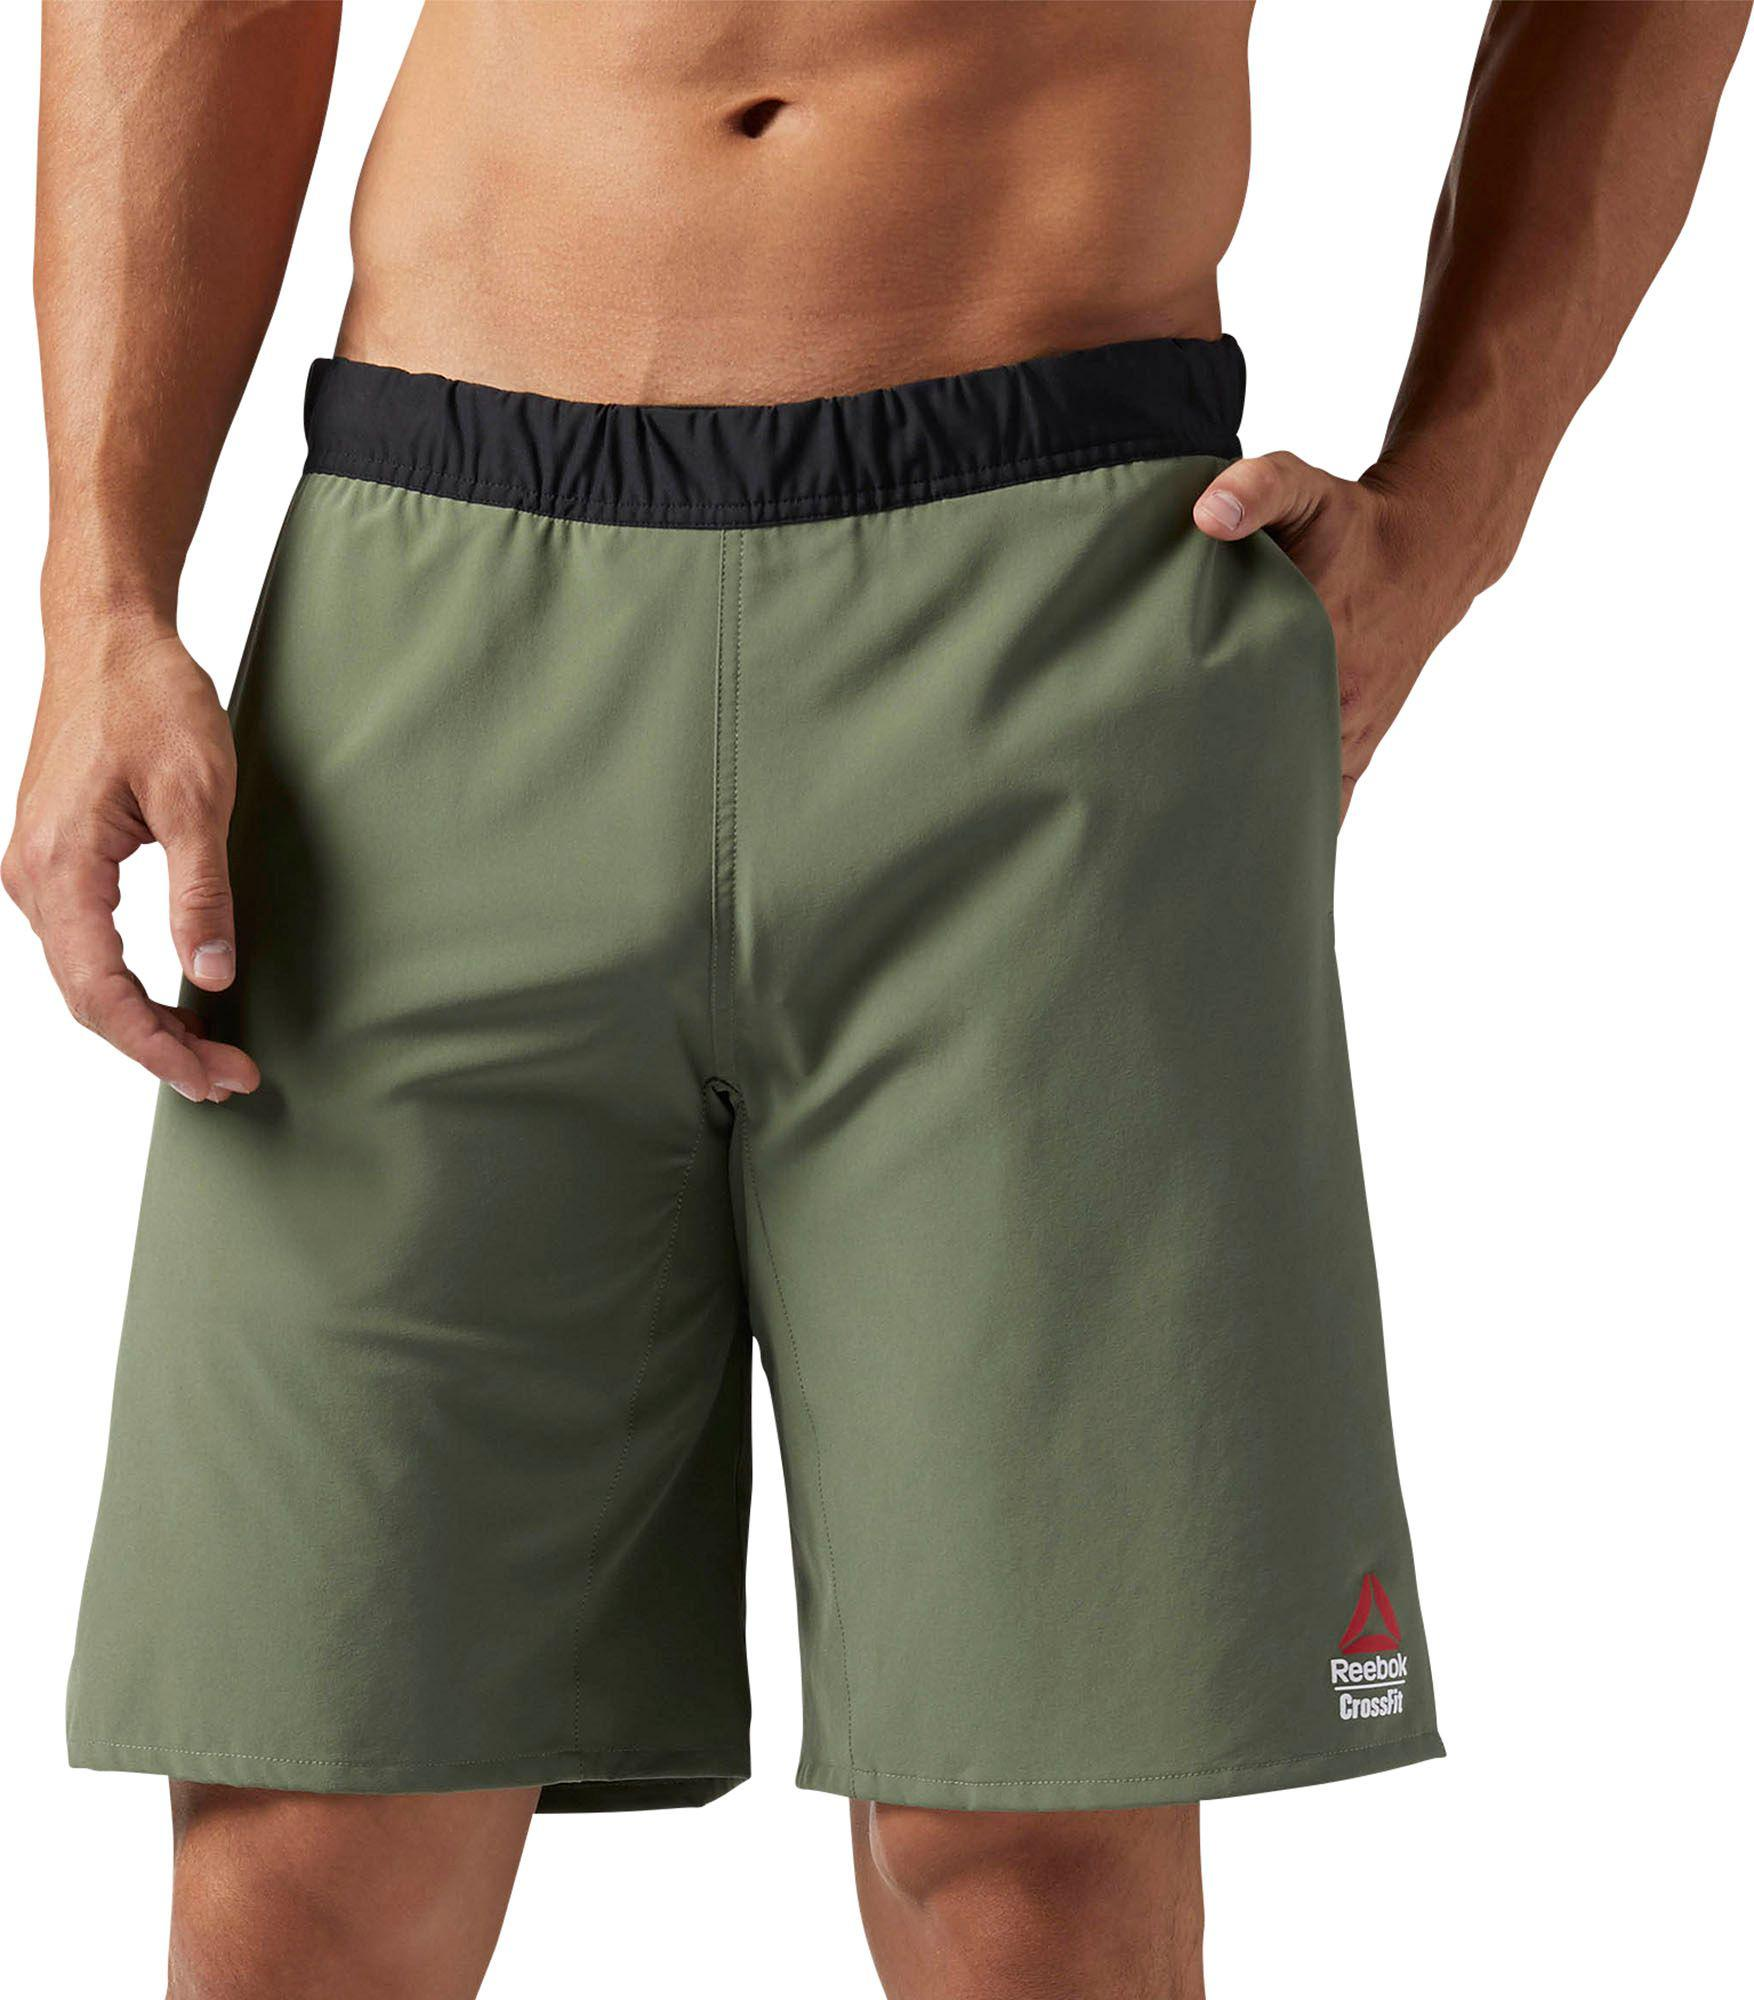 19ae7b2182b4 Lyst - Reebok Crossfit Super Nasty Speed Ii 10   Shorts in Green for Men